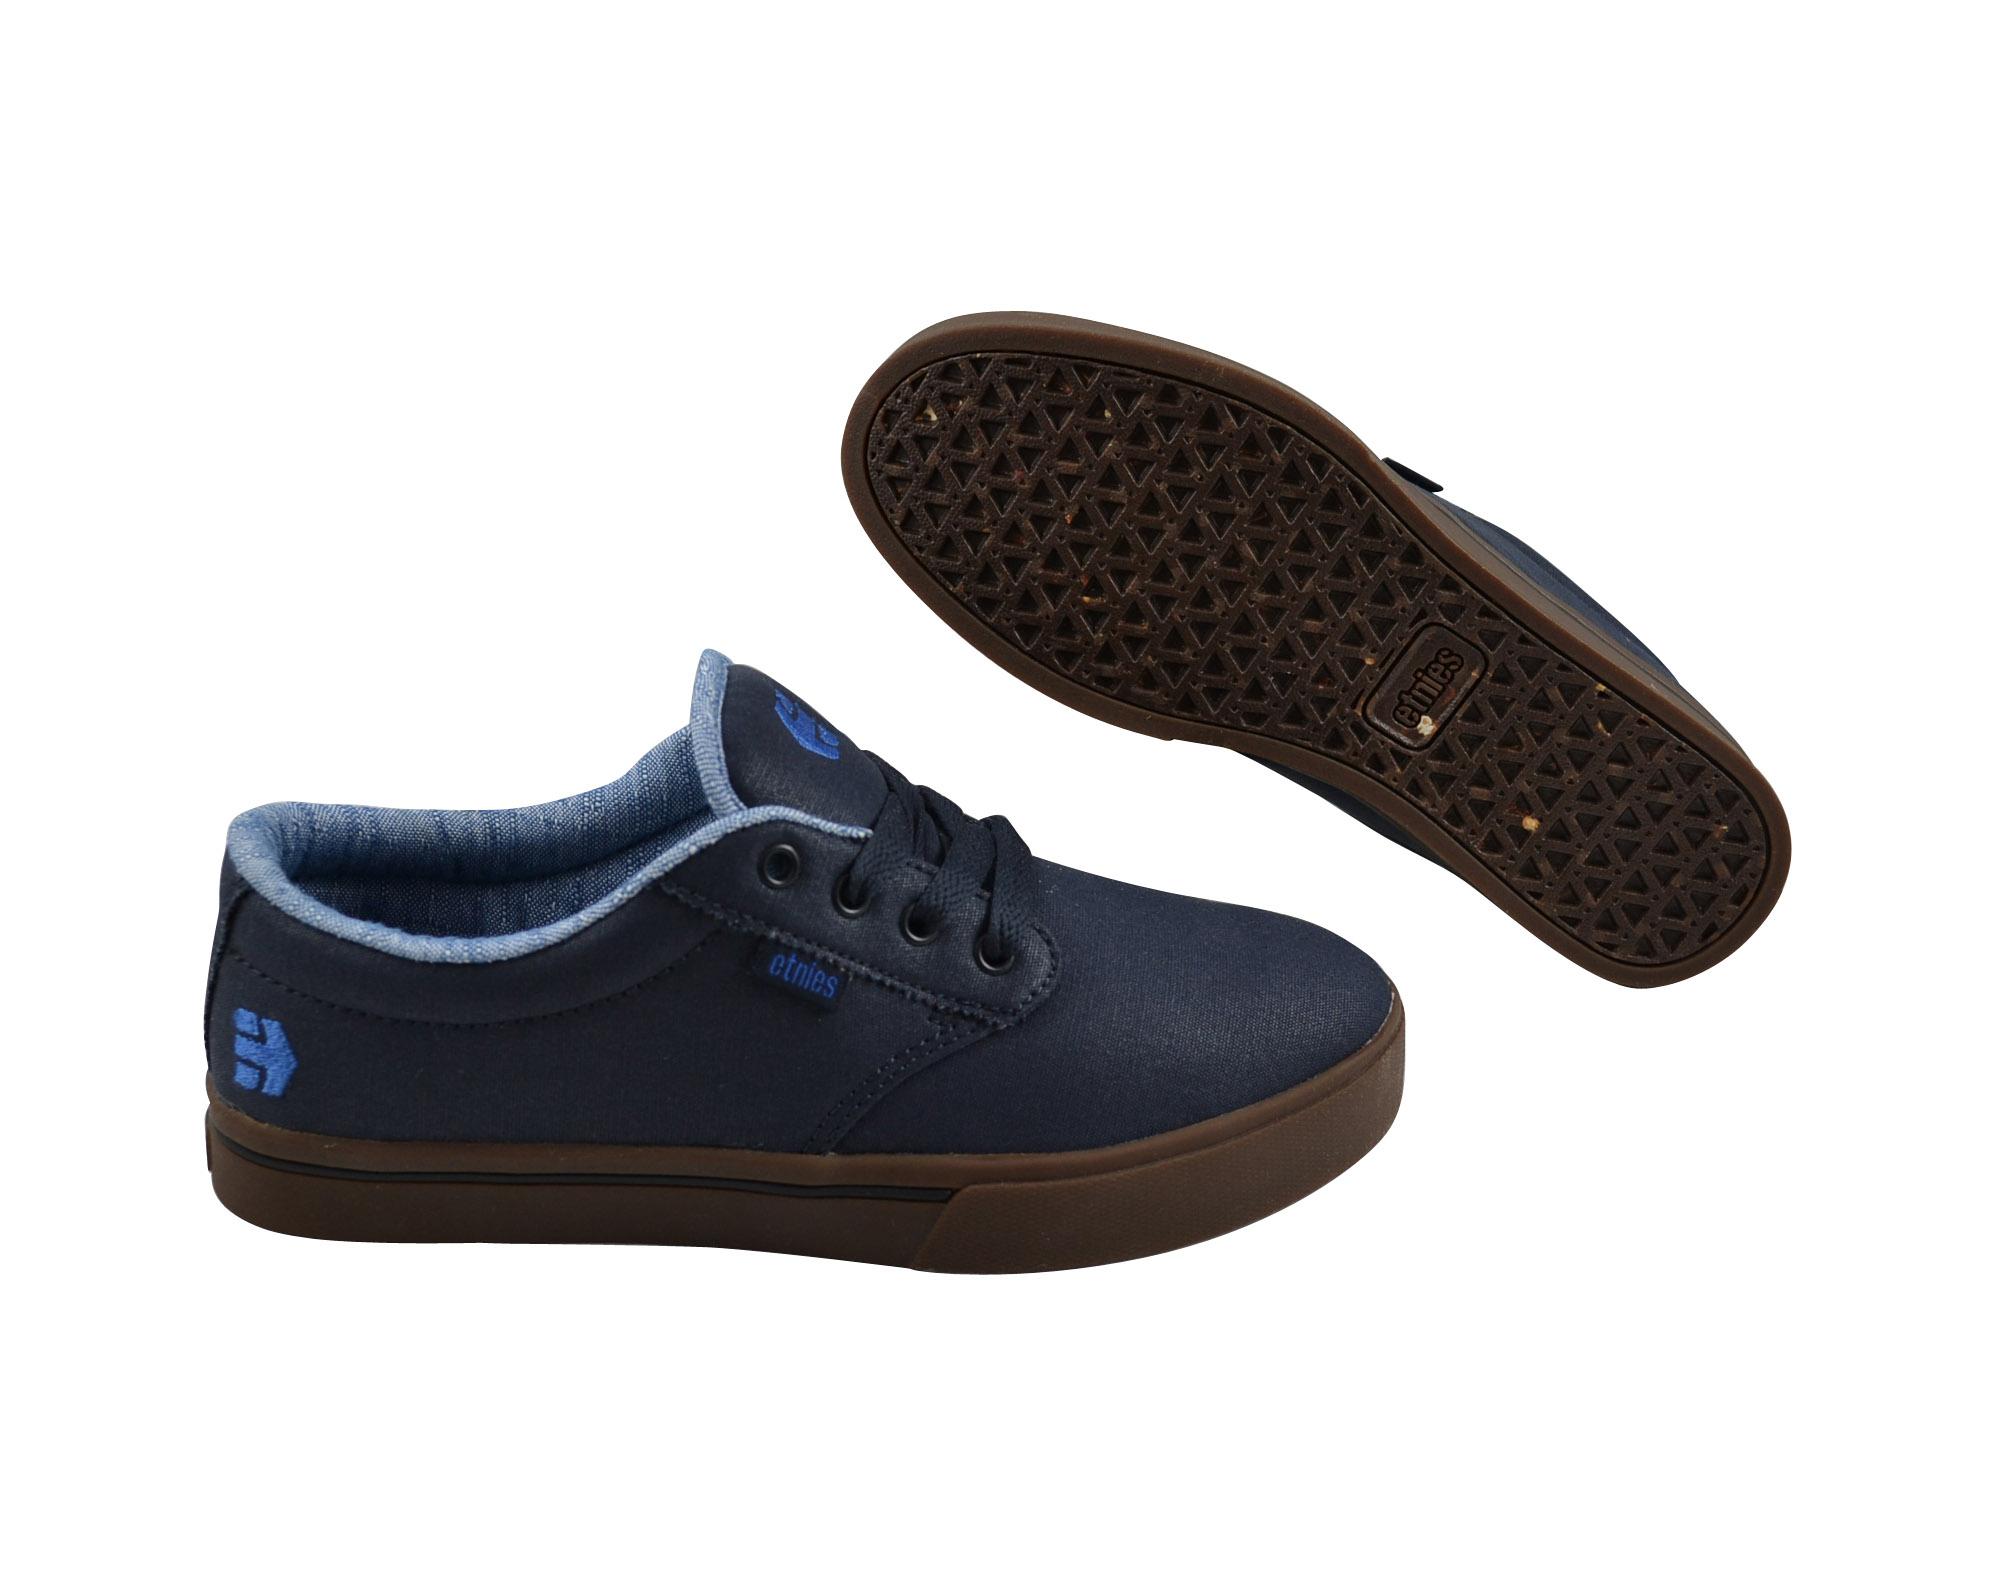 2 Jameson ETNIES ECO schwarz 4101000323 979 gum Weiß Schuhe